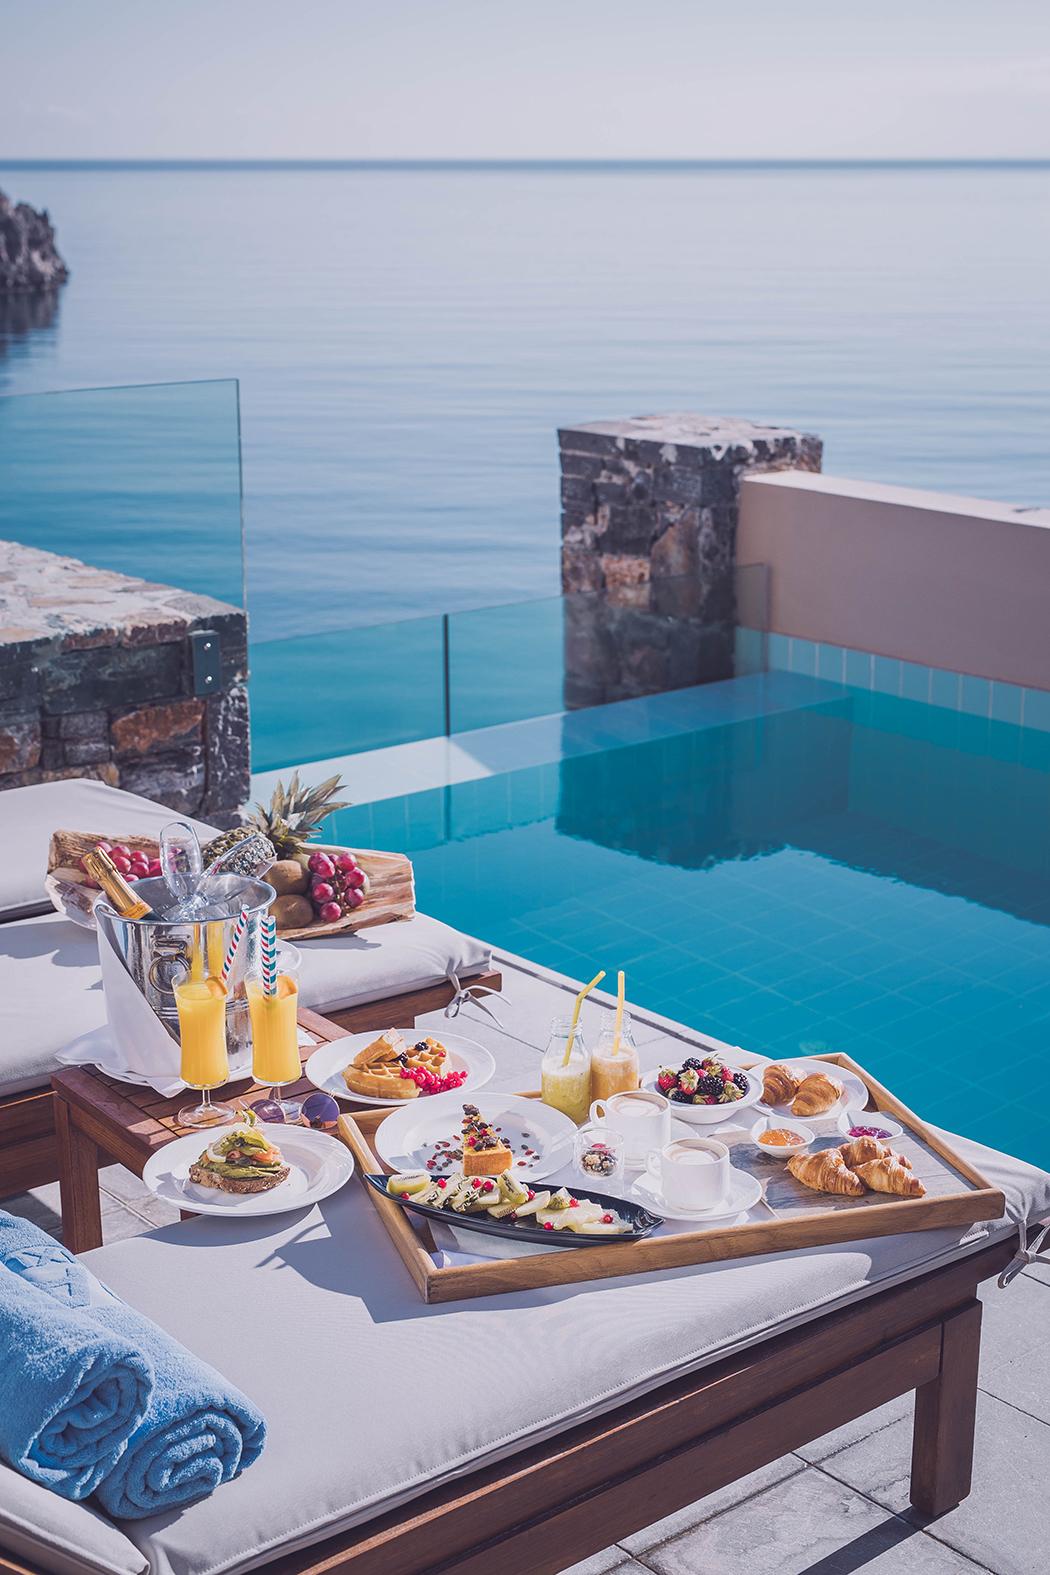 Travelblog-Travelblogger-Travel-Blog-Blogger-Muenchen-Deutschland-Kreta-Land_Rover-Experience-Kreta-Daios_Cove-Hotel-Lindarella-28-web